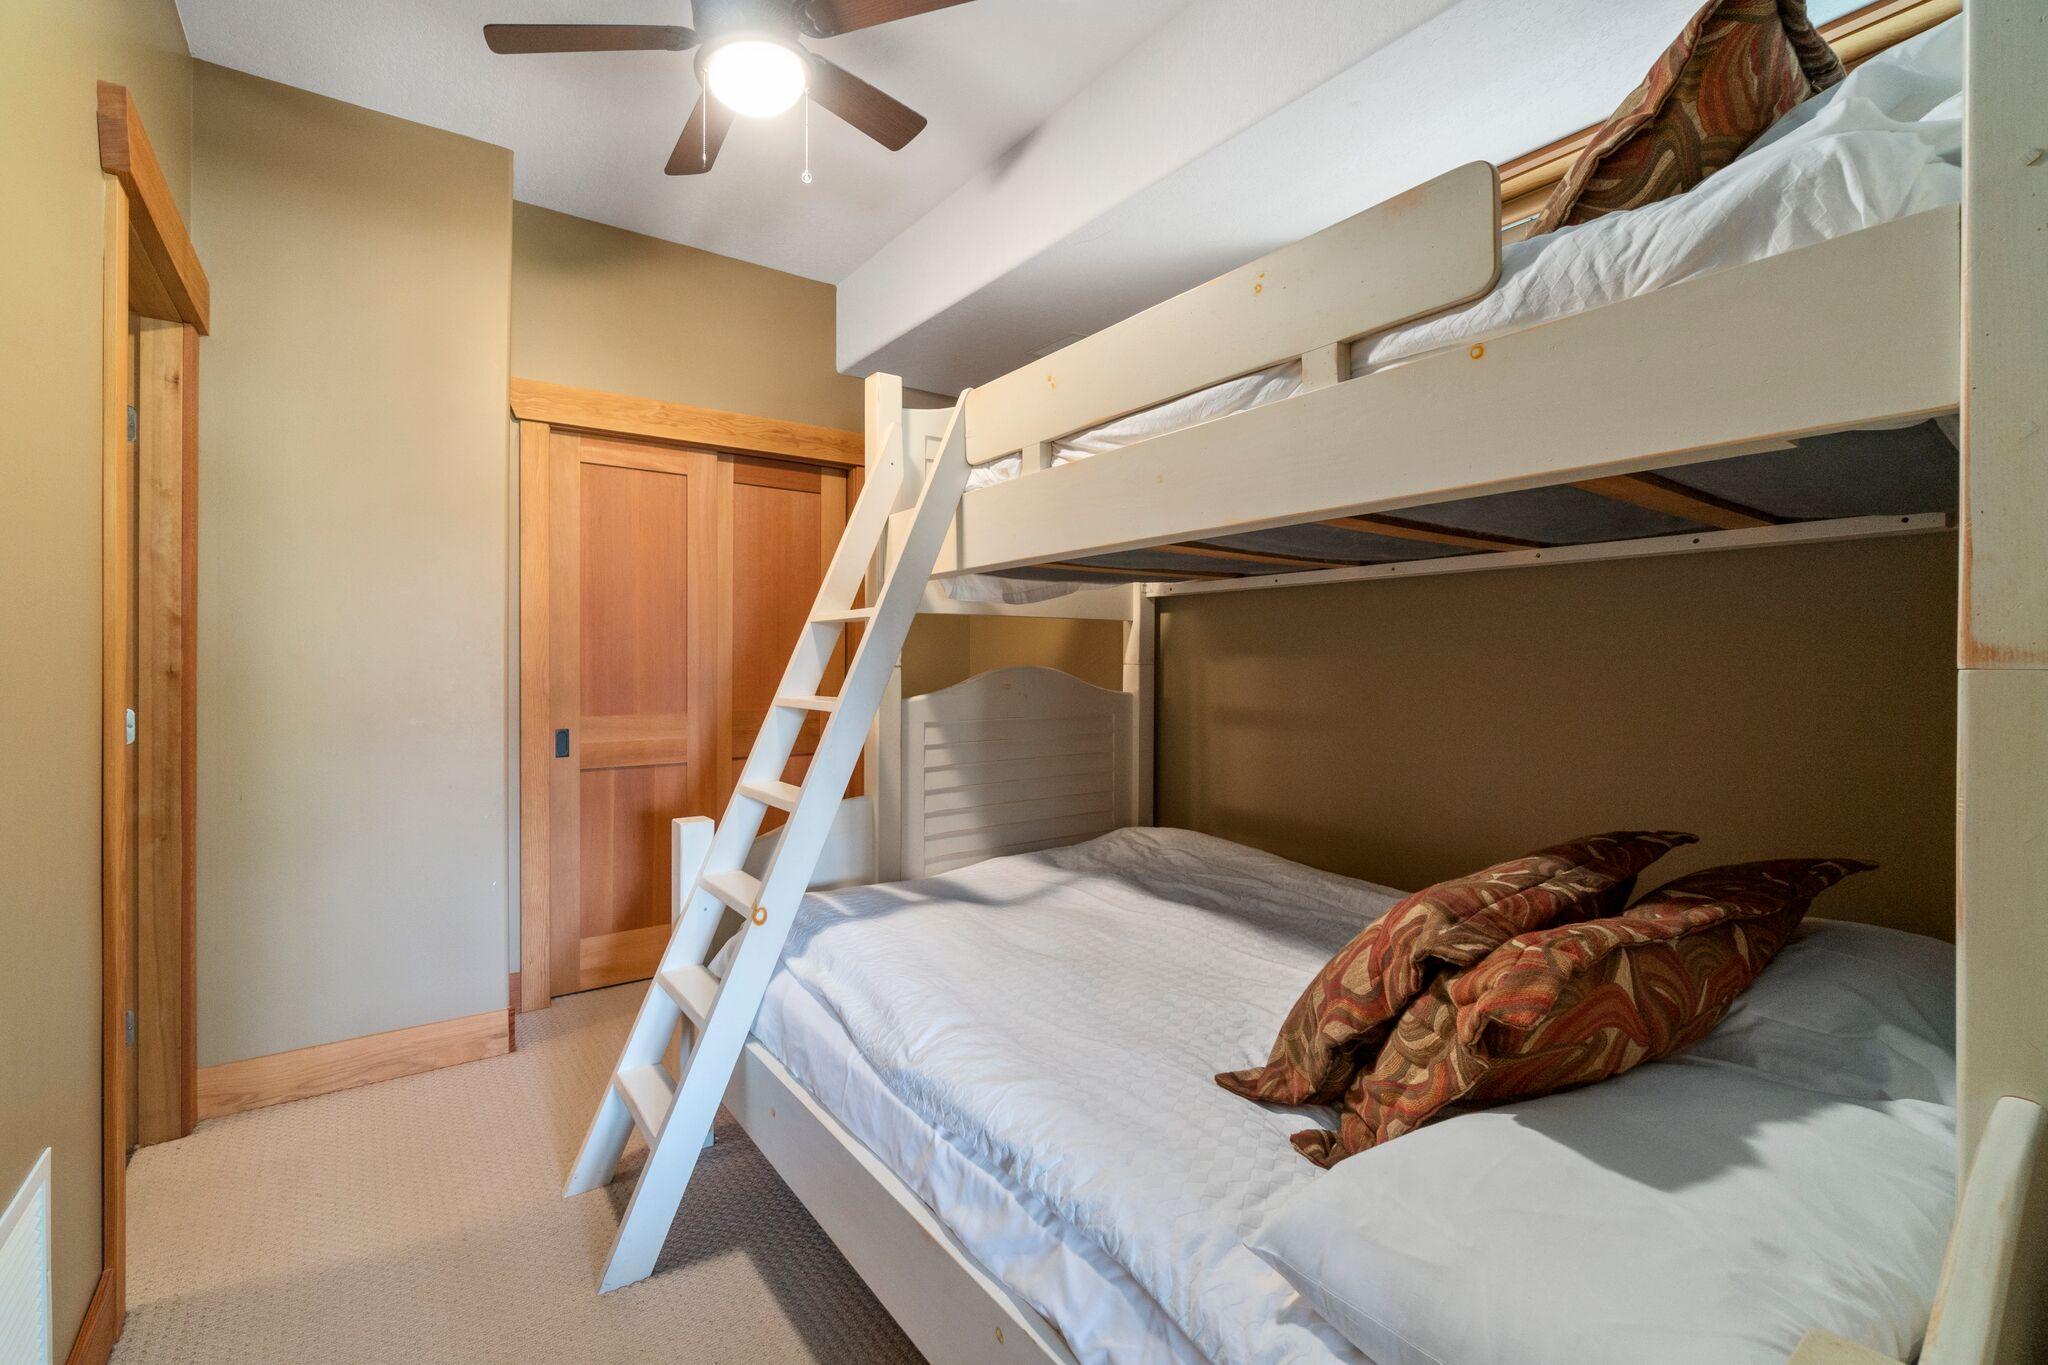 3rd Bedroom - Double/Single Bunk